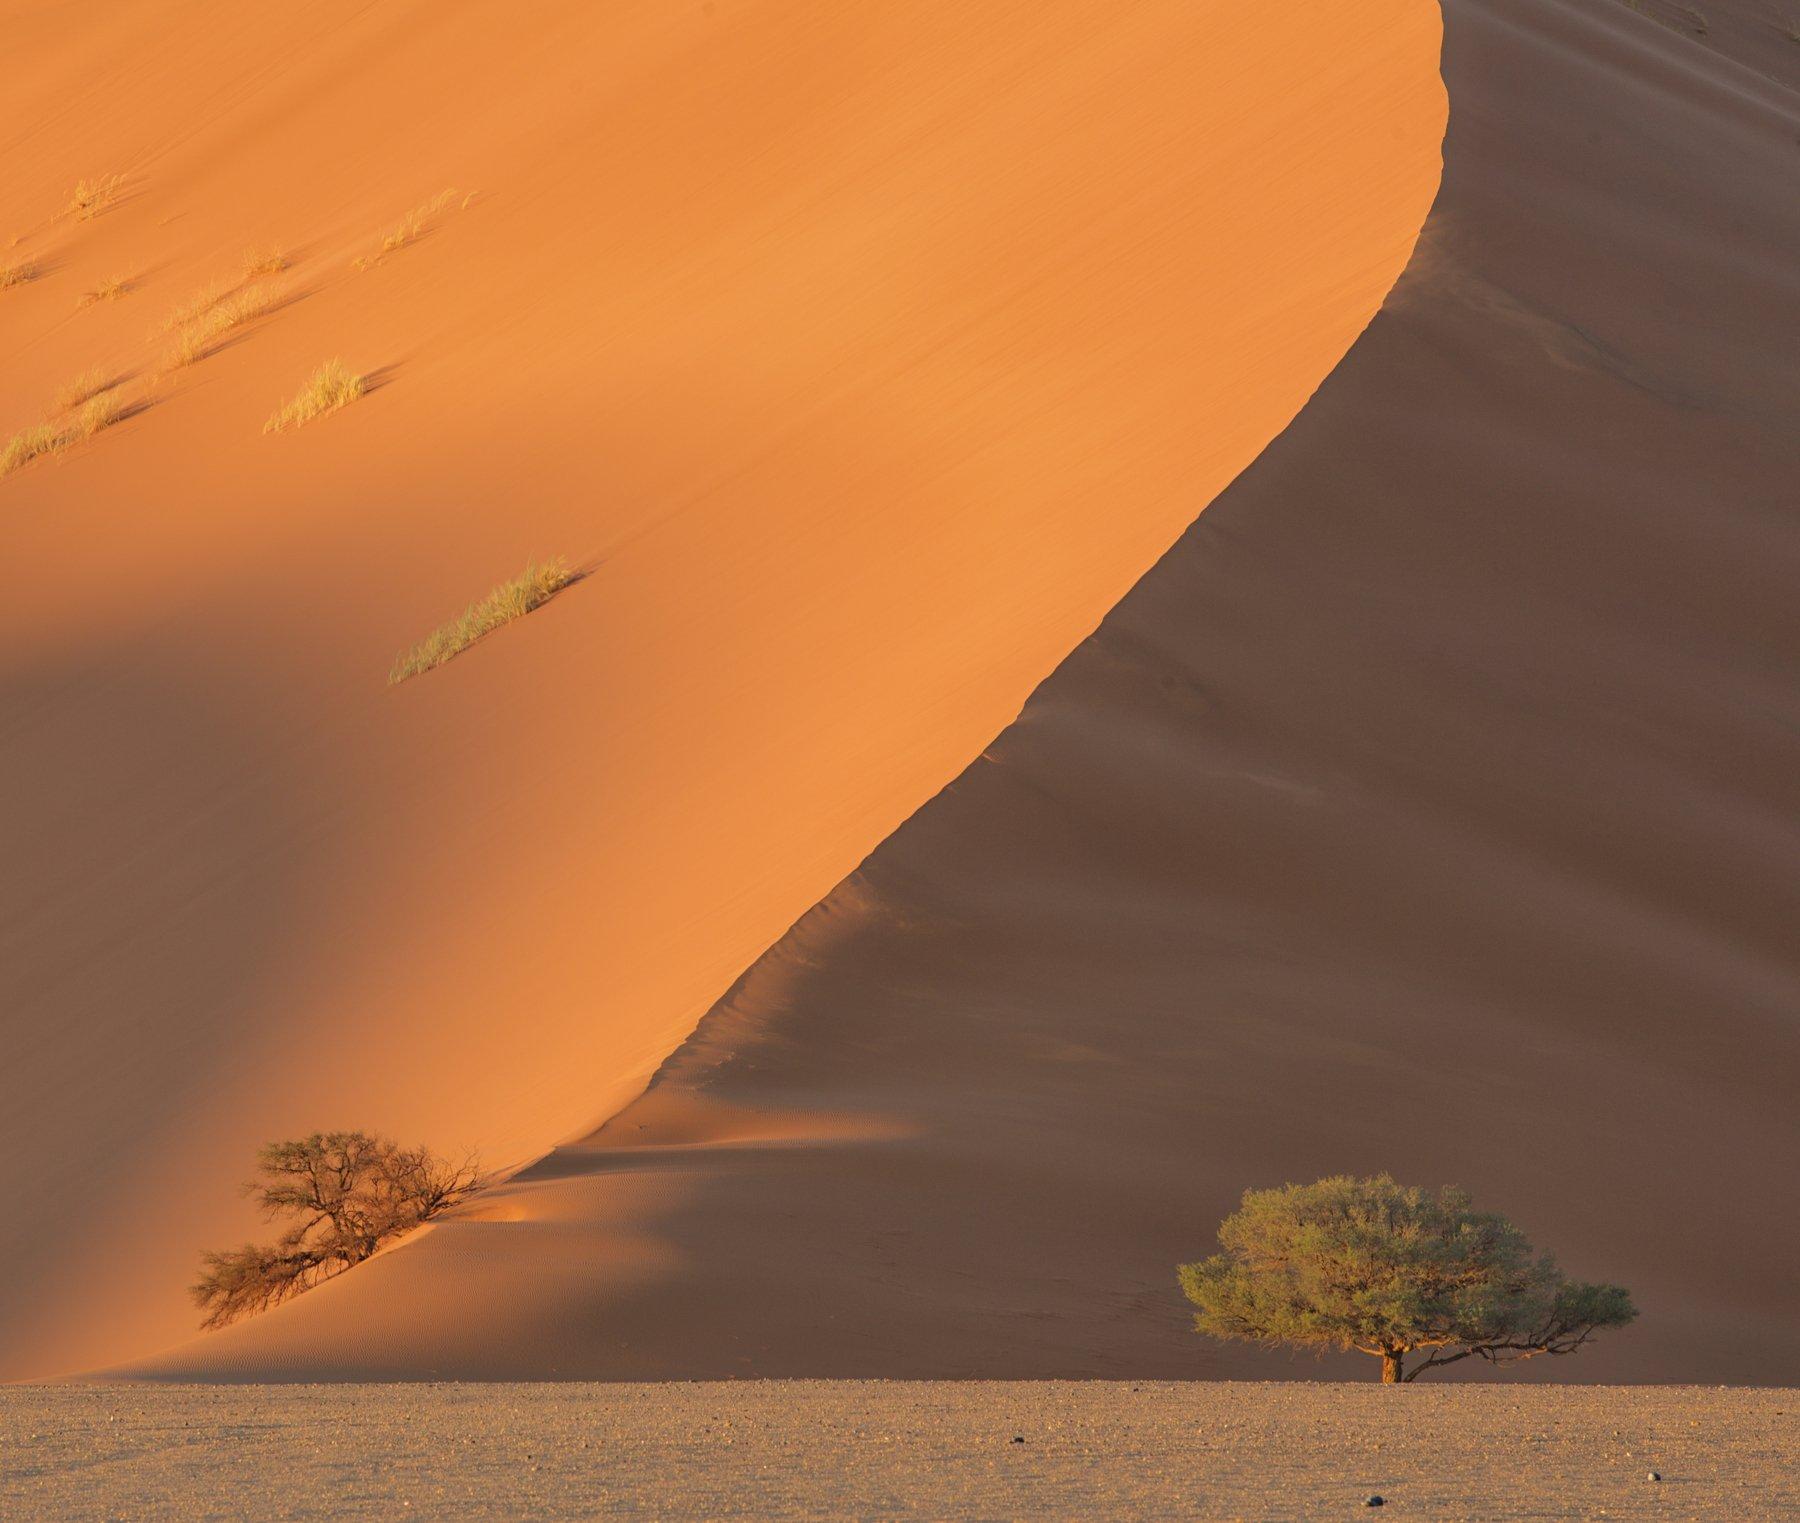 namibia, намибия, #loveafrica, sossusvlei, dunesnamib-naukluft national park, sesriem, mc, Маргарита Чернилова